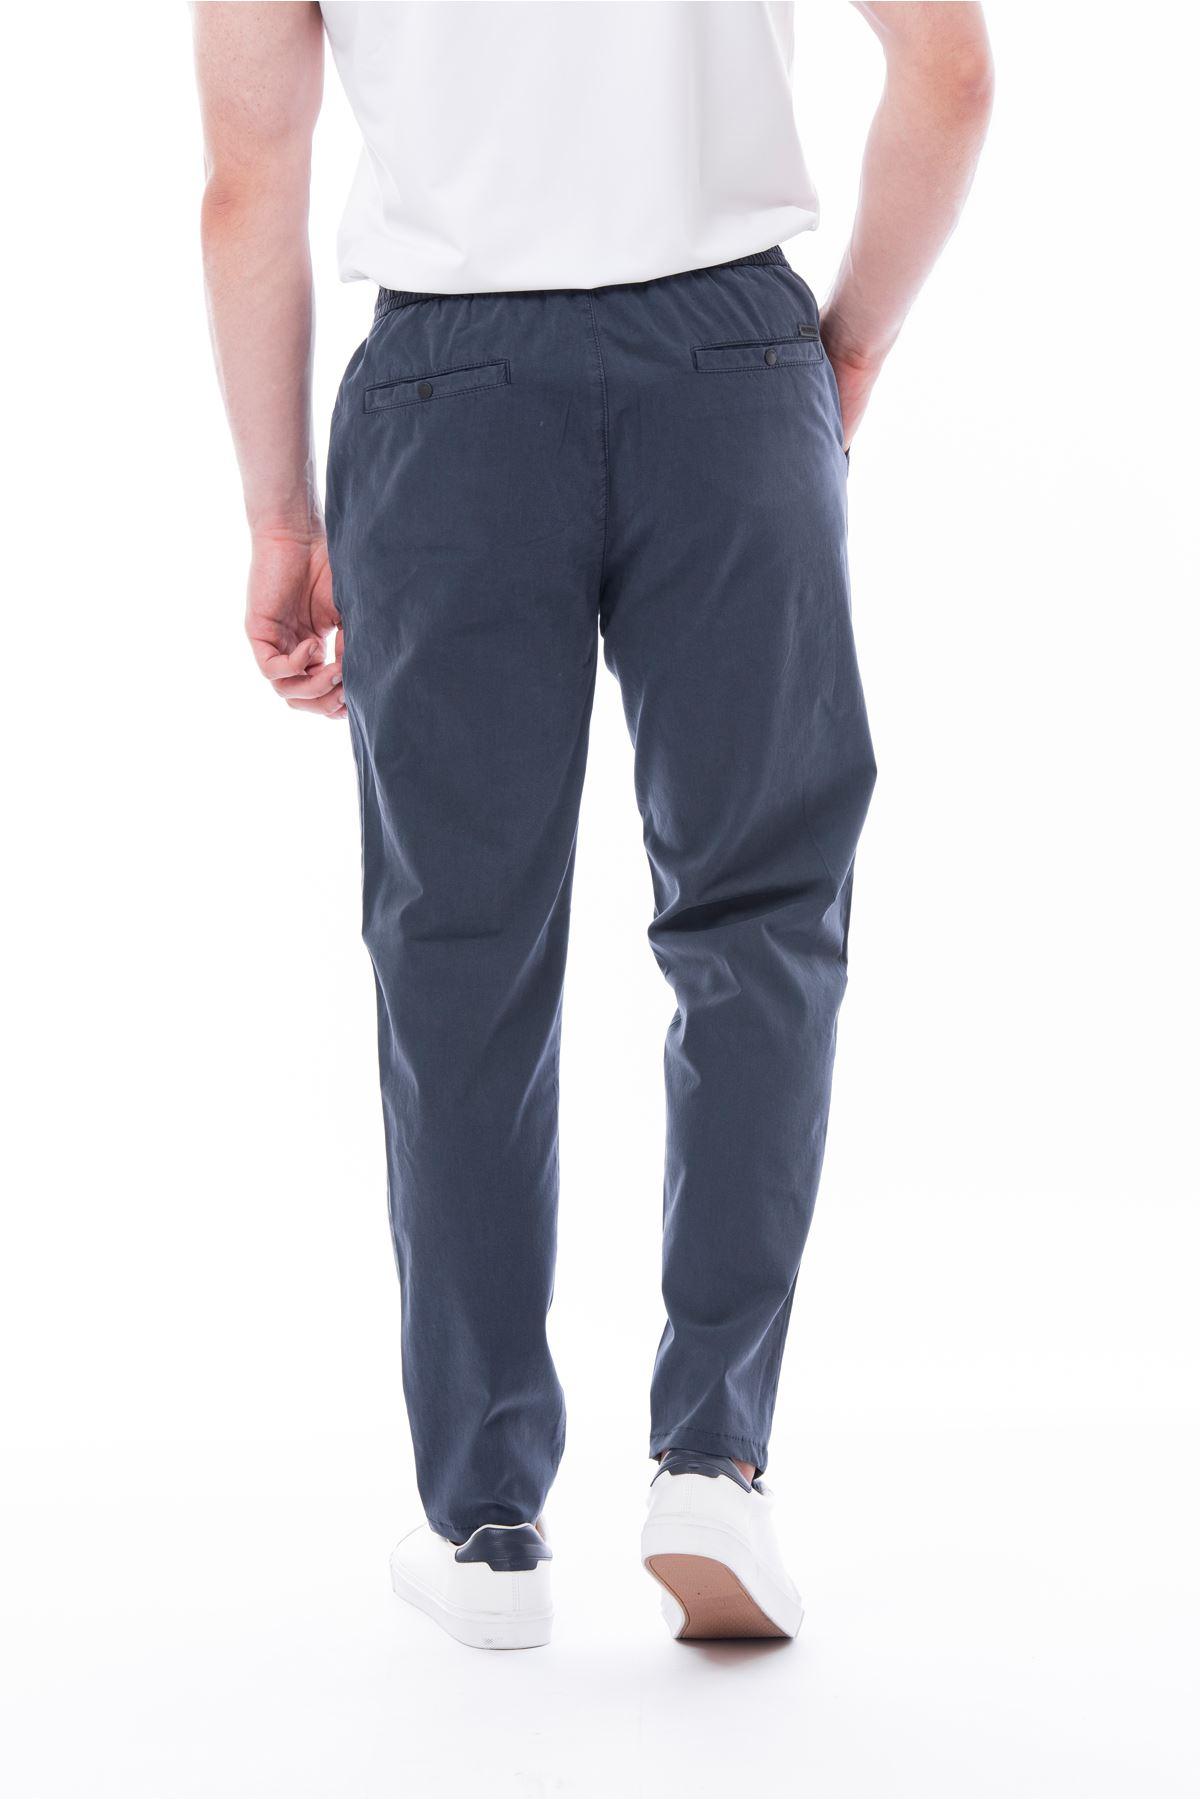 İndigo Beli Lastikli Bağcıklı Jogger Pantolon